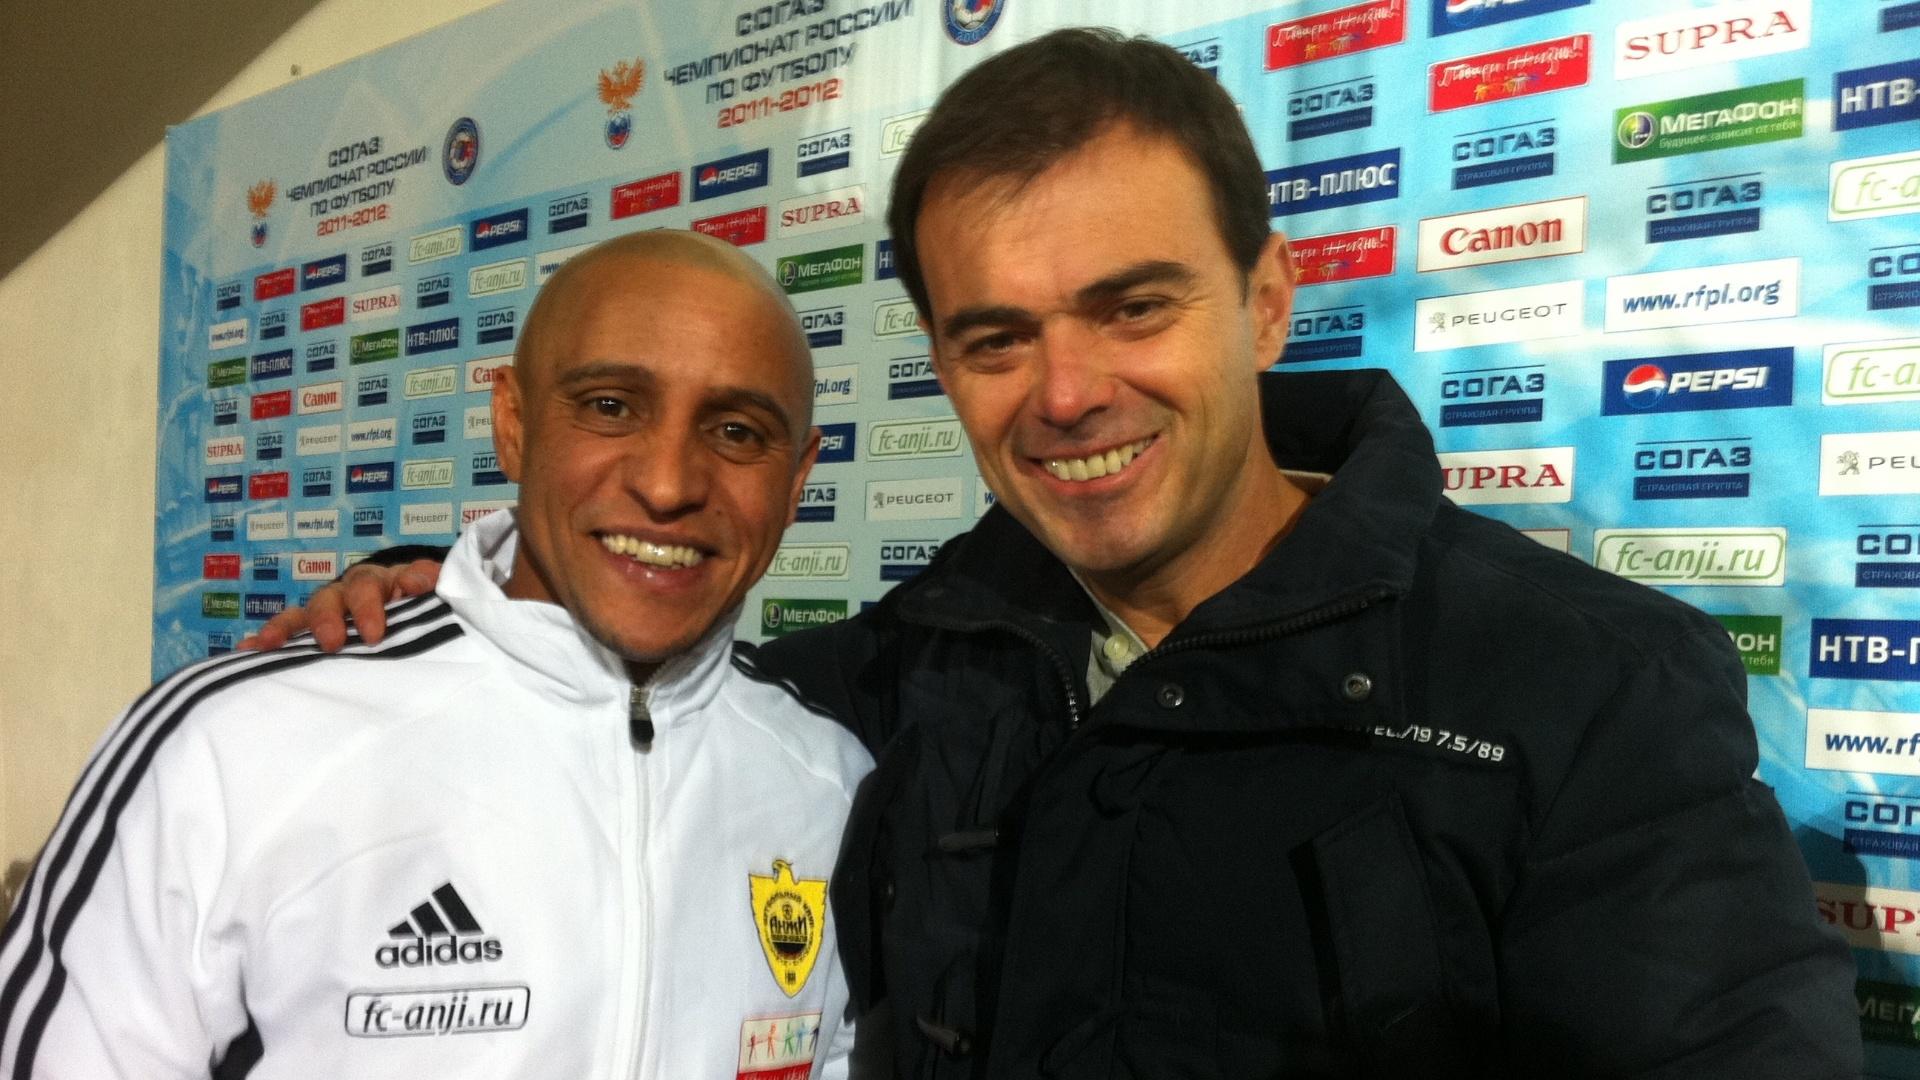 Tino Marcos entrevista o jogador de futebol Roberto Carlos na Rússia (16/12/11)